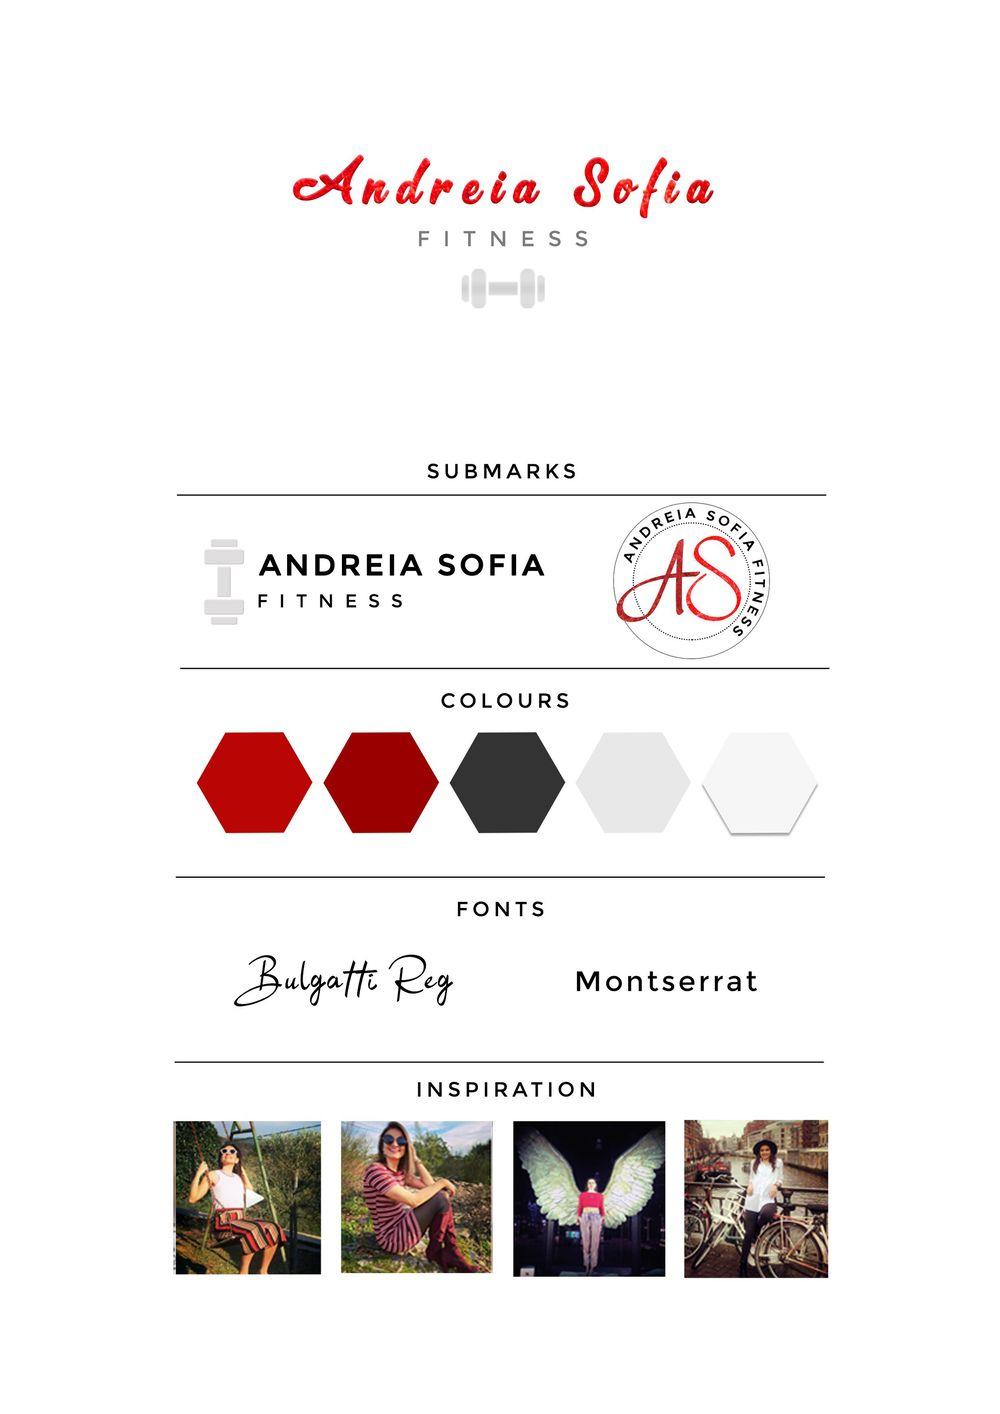 Andreia Sofia - image 2 - student project